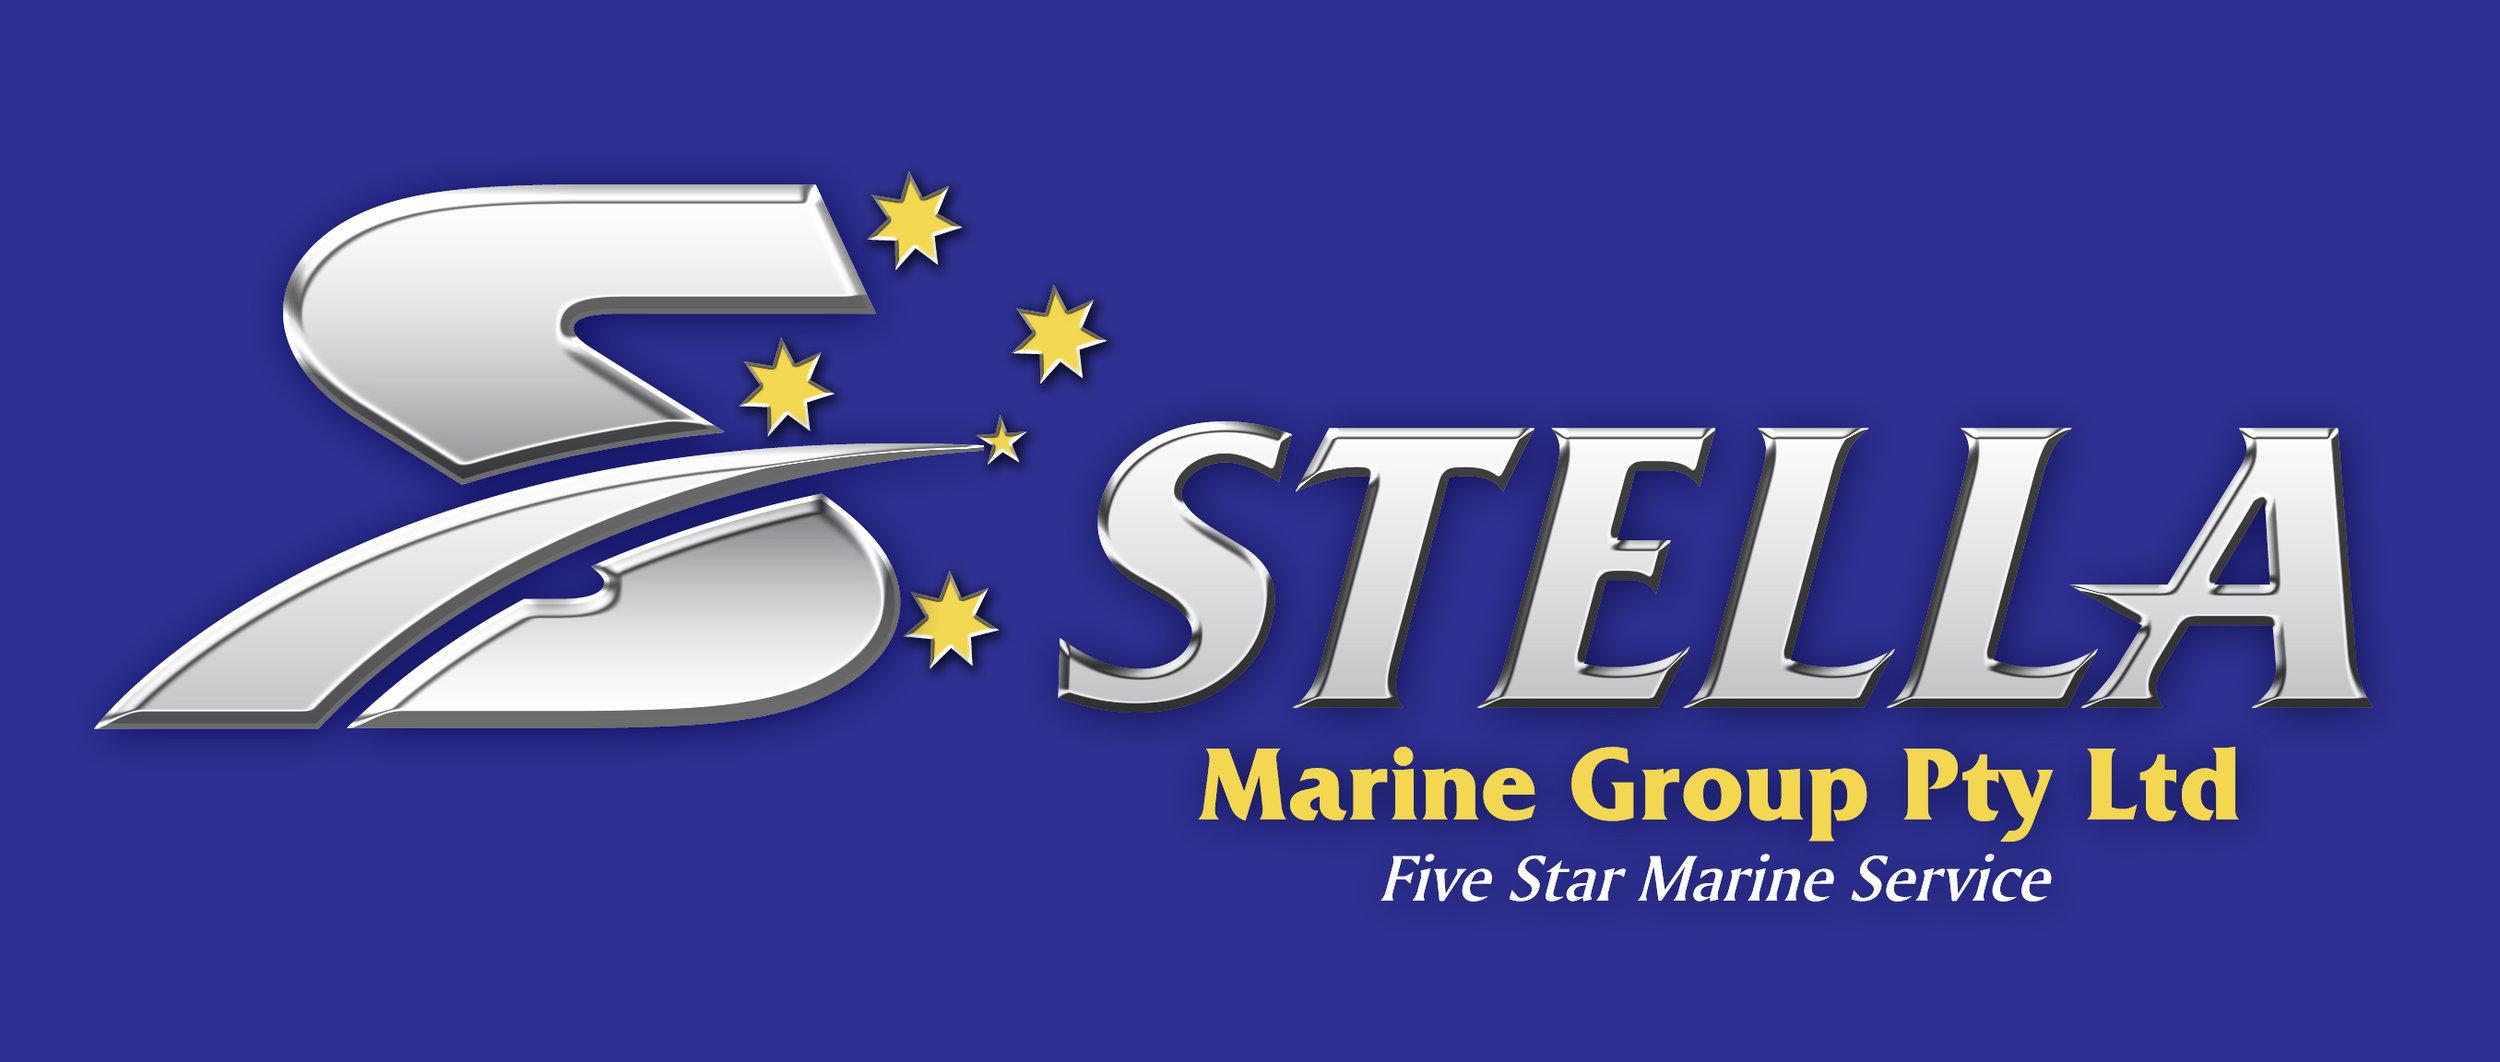 Stella logo.jpg